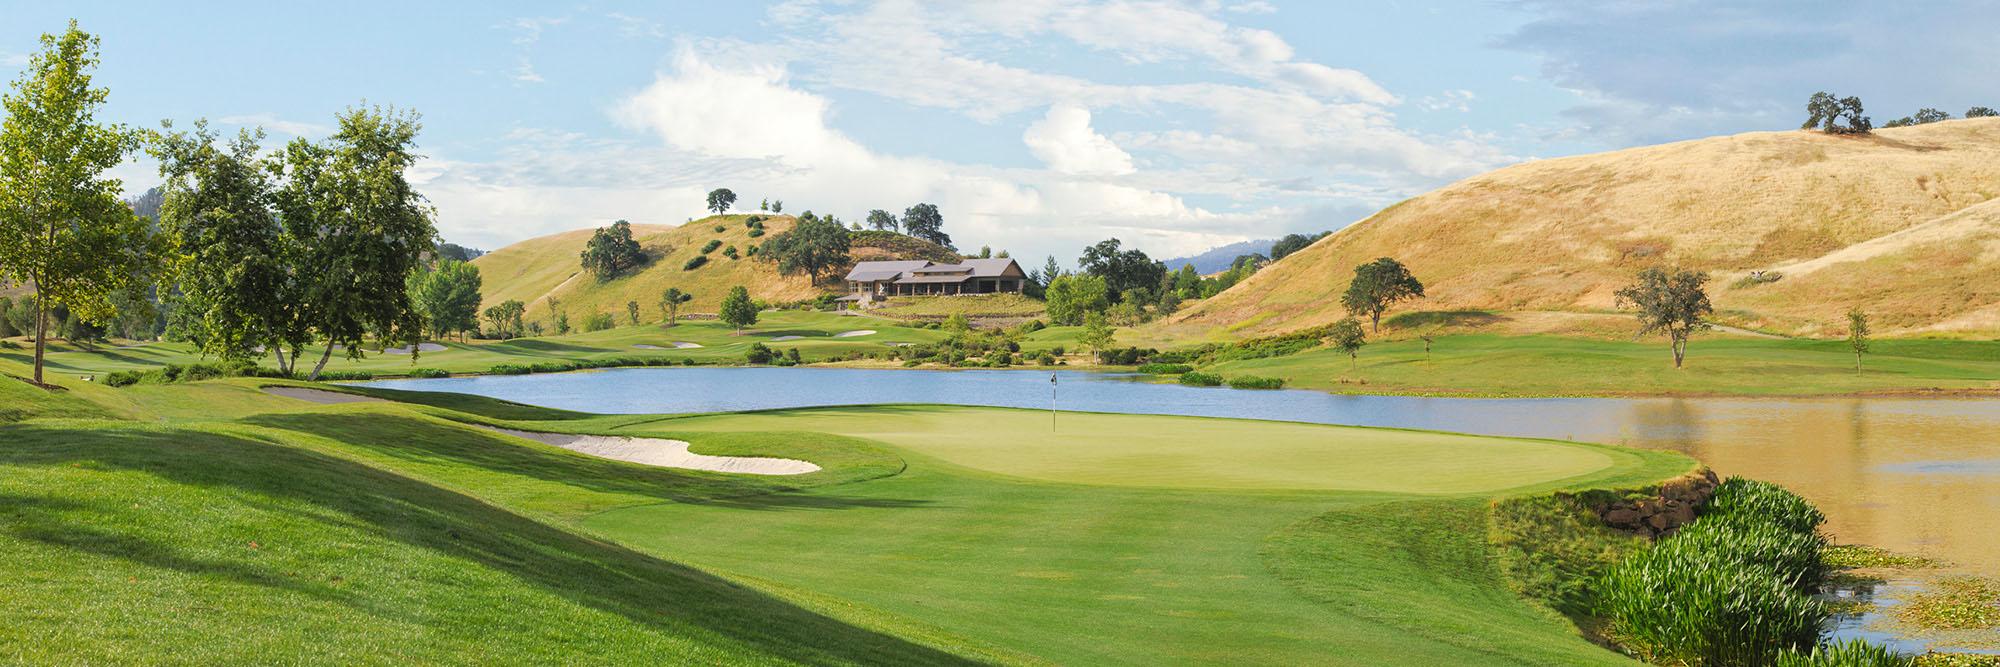 Golf Course Image - Yocha Dehe No. 17